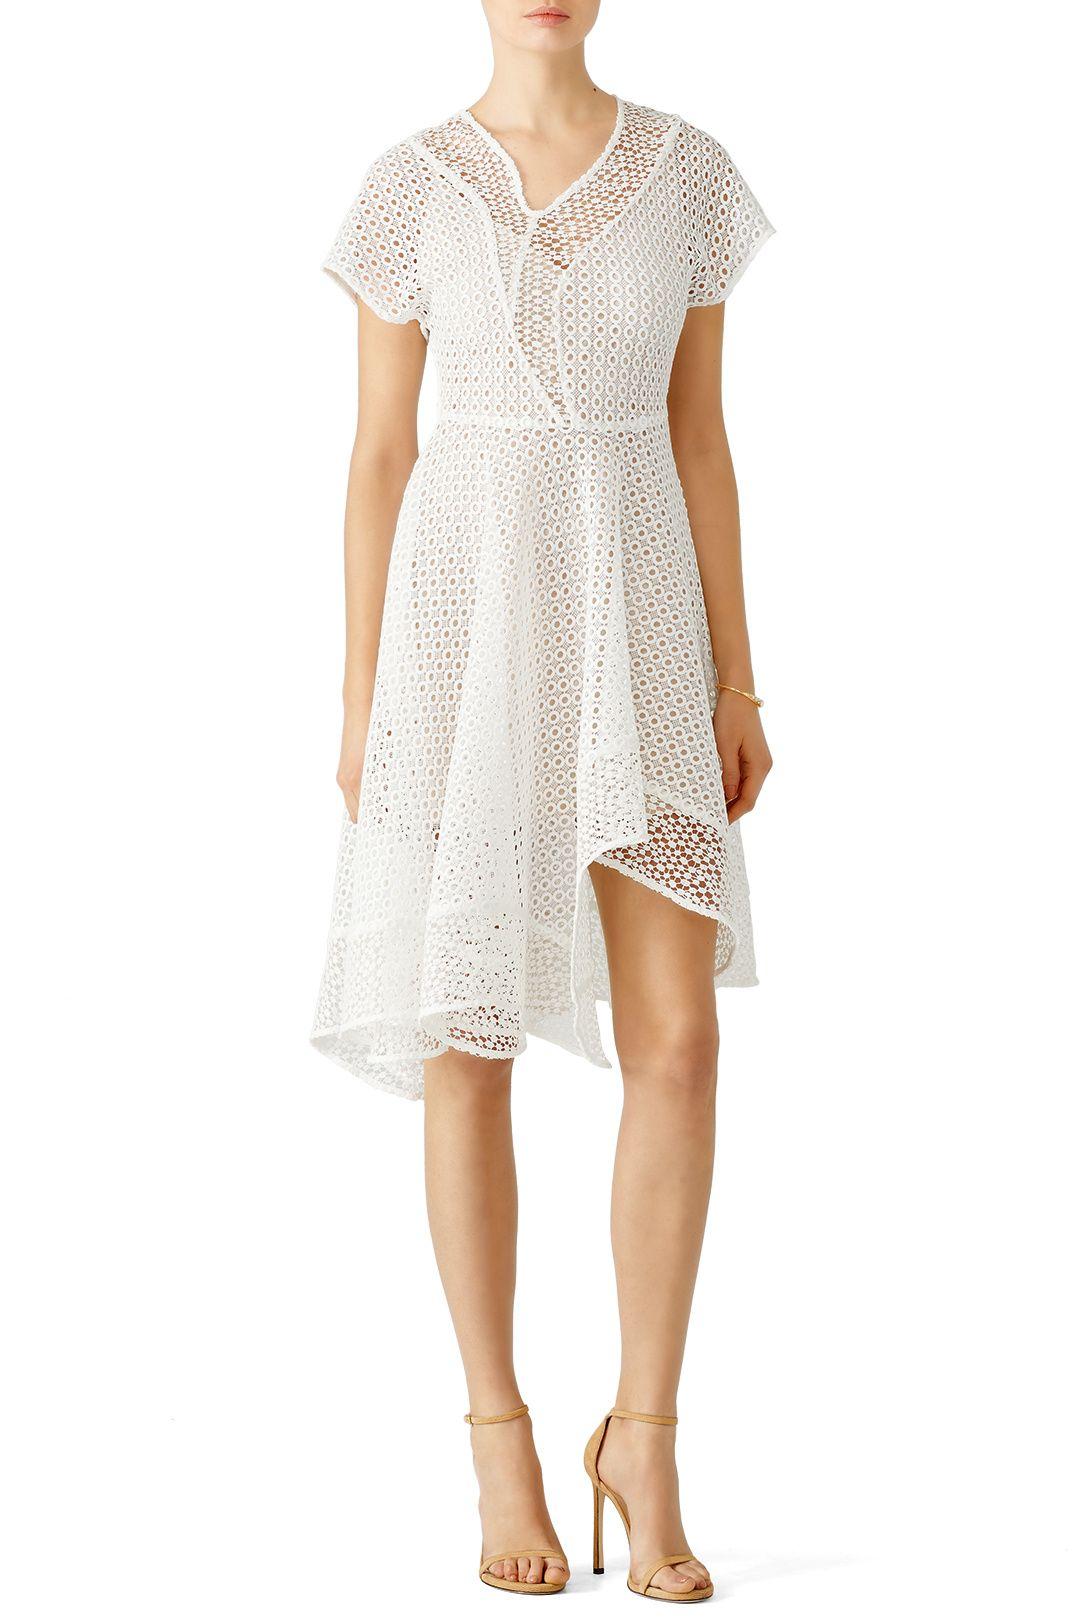 White Asymmetrical Eyelet Dress Dresses, Wedding attire